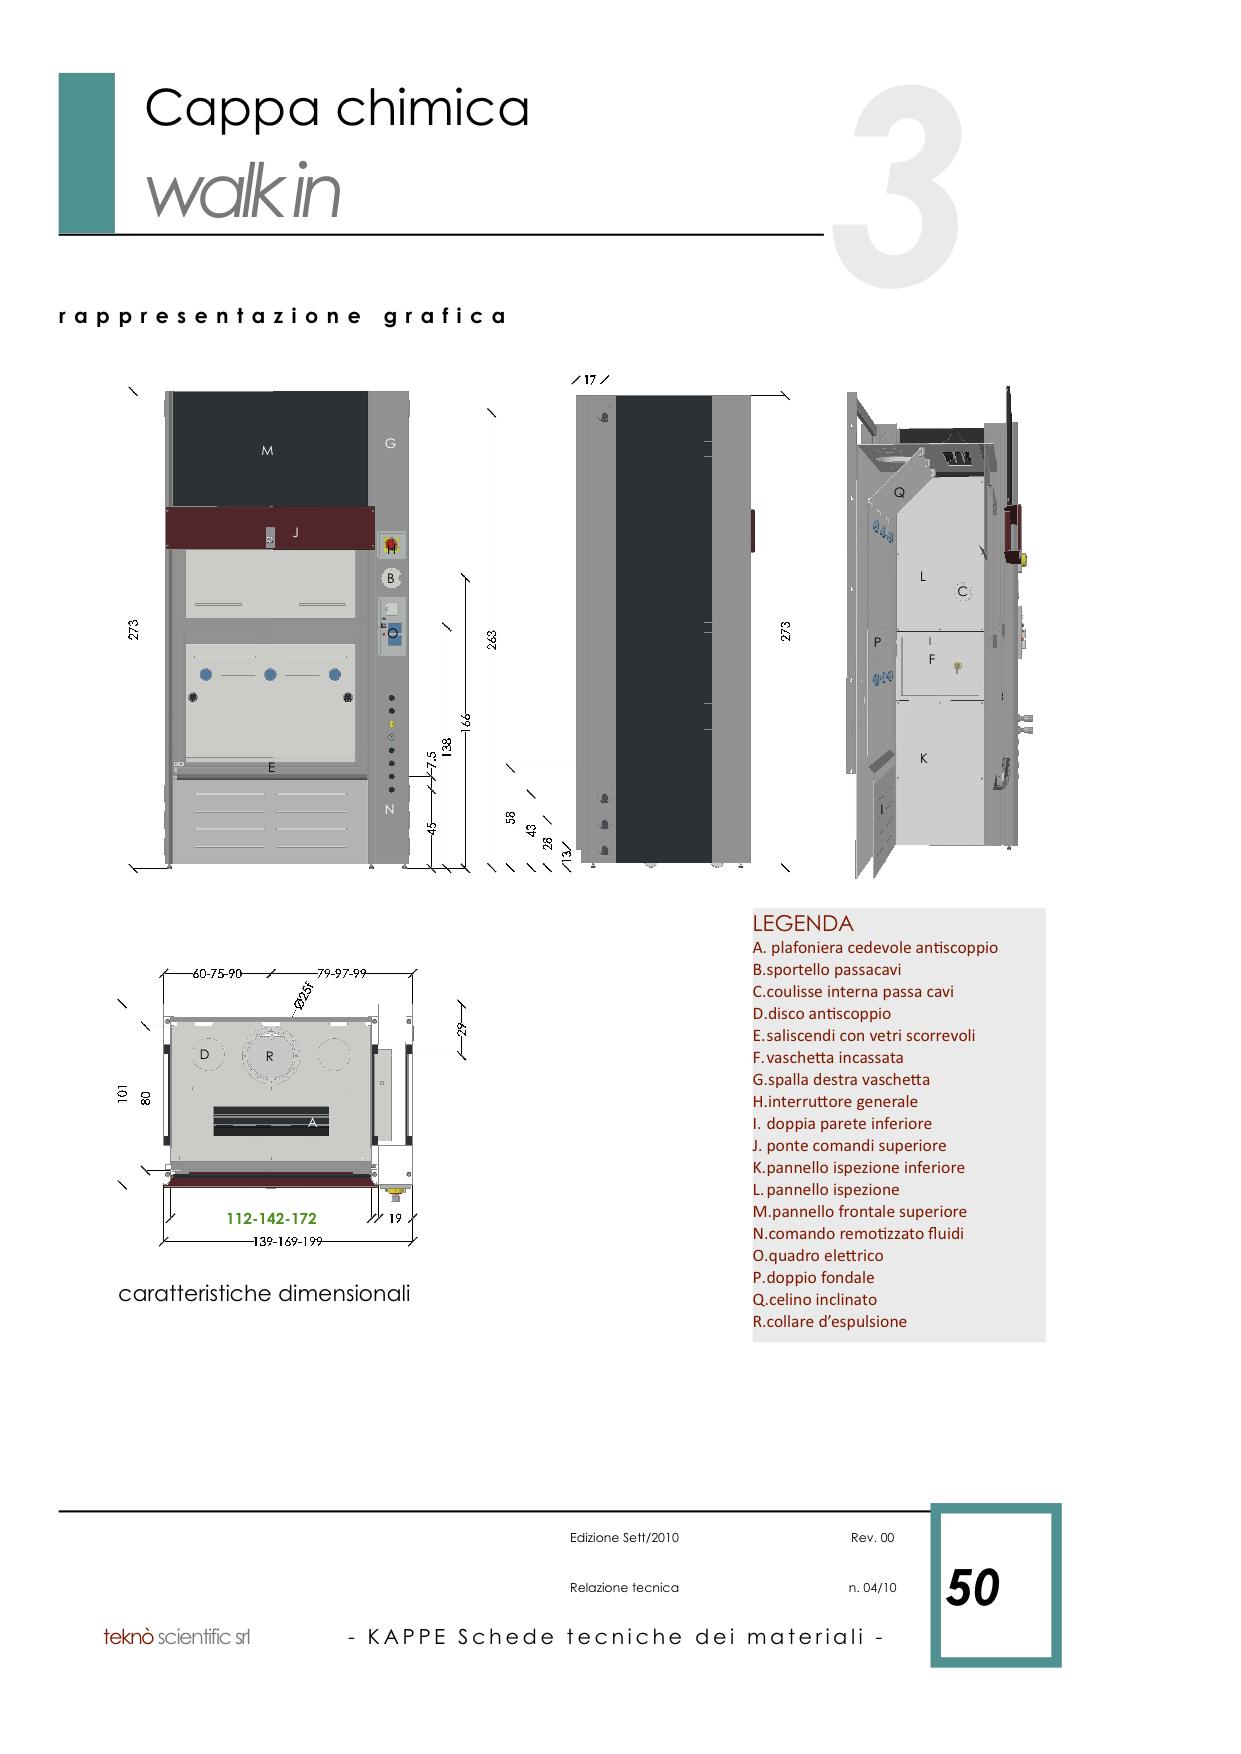 KAPPE Schede tecniche materiali copia 10.png